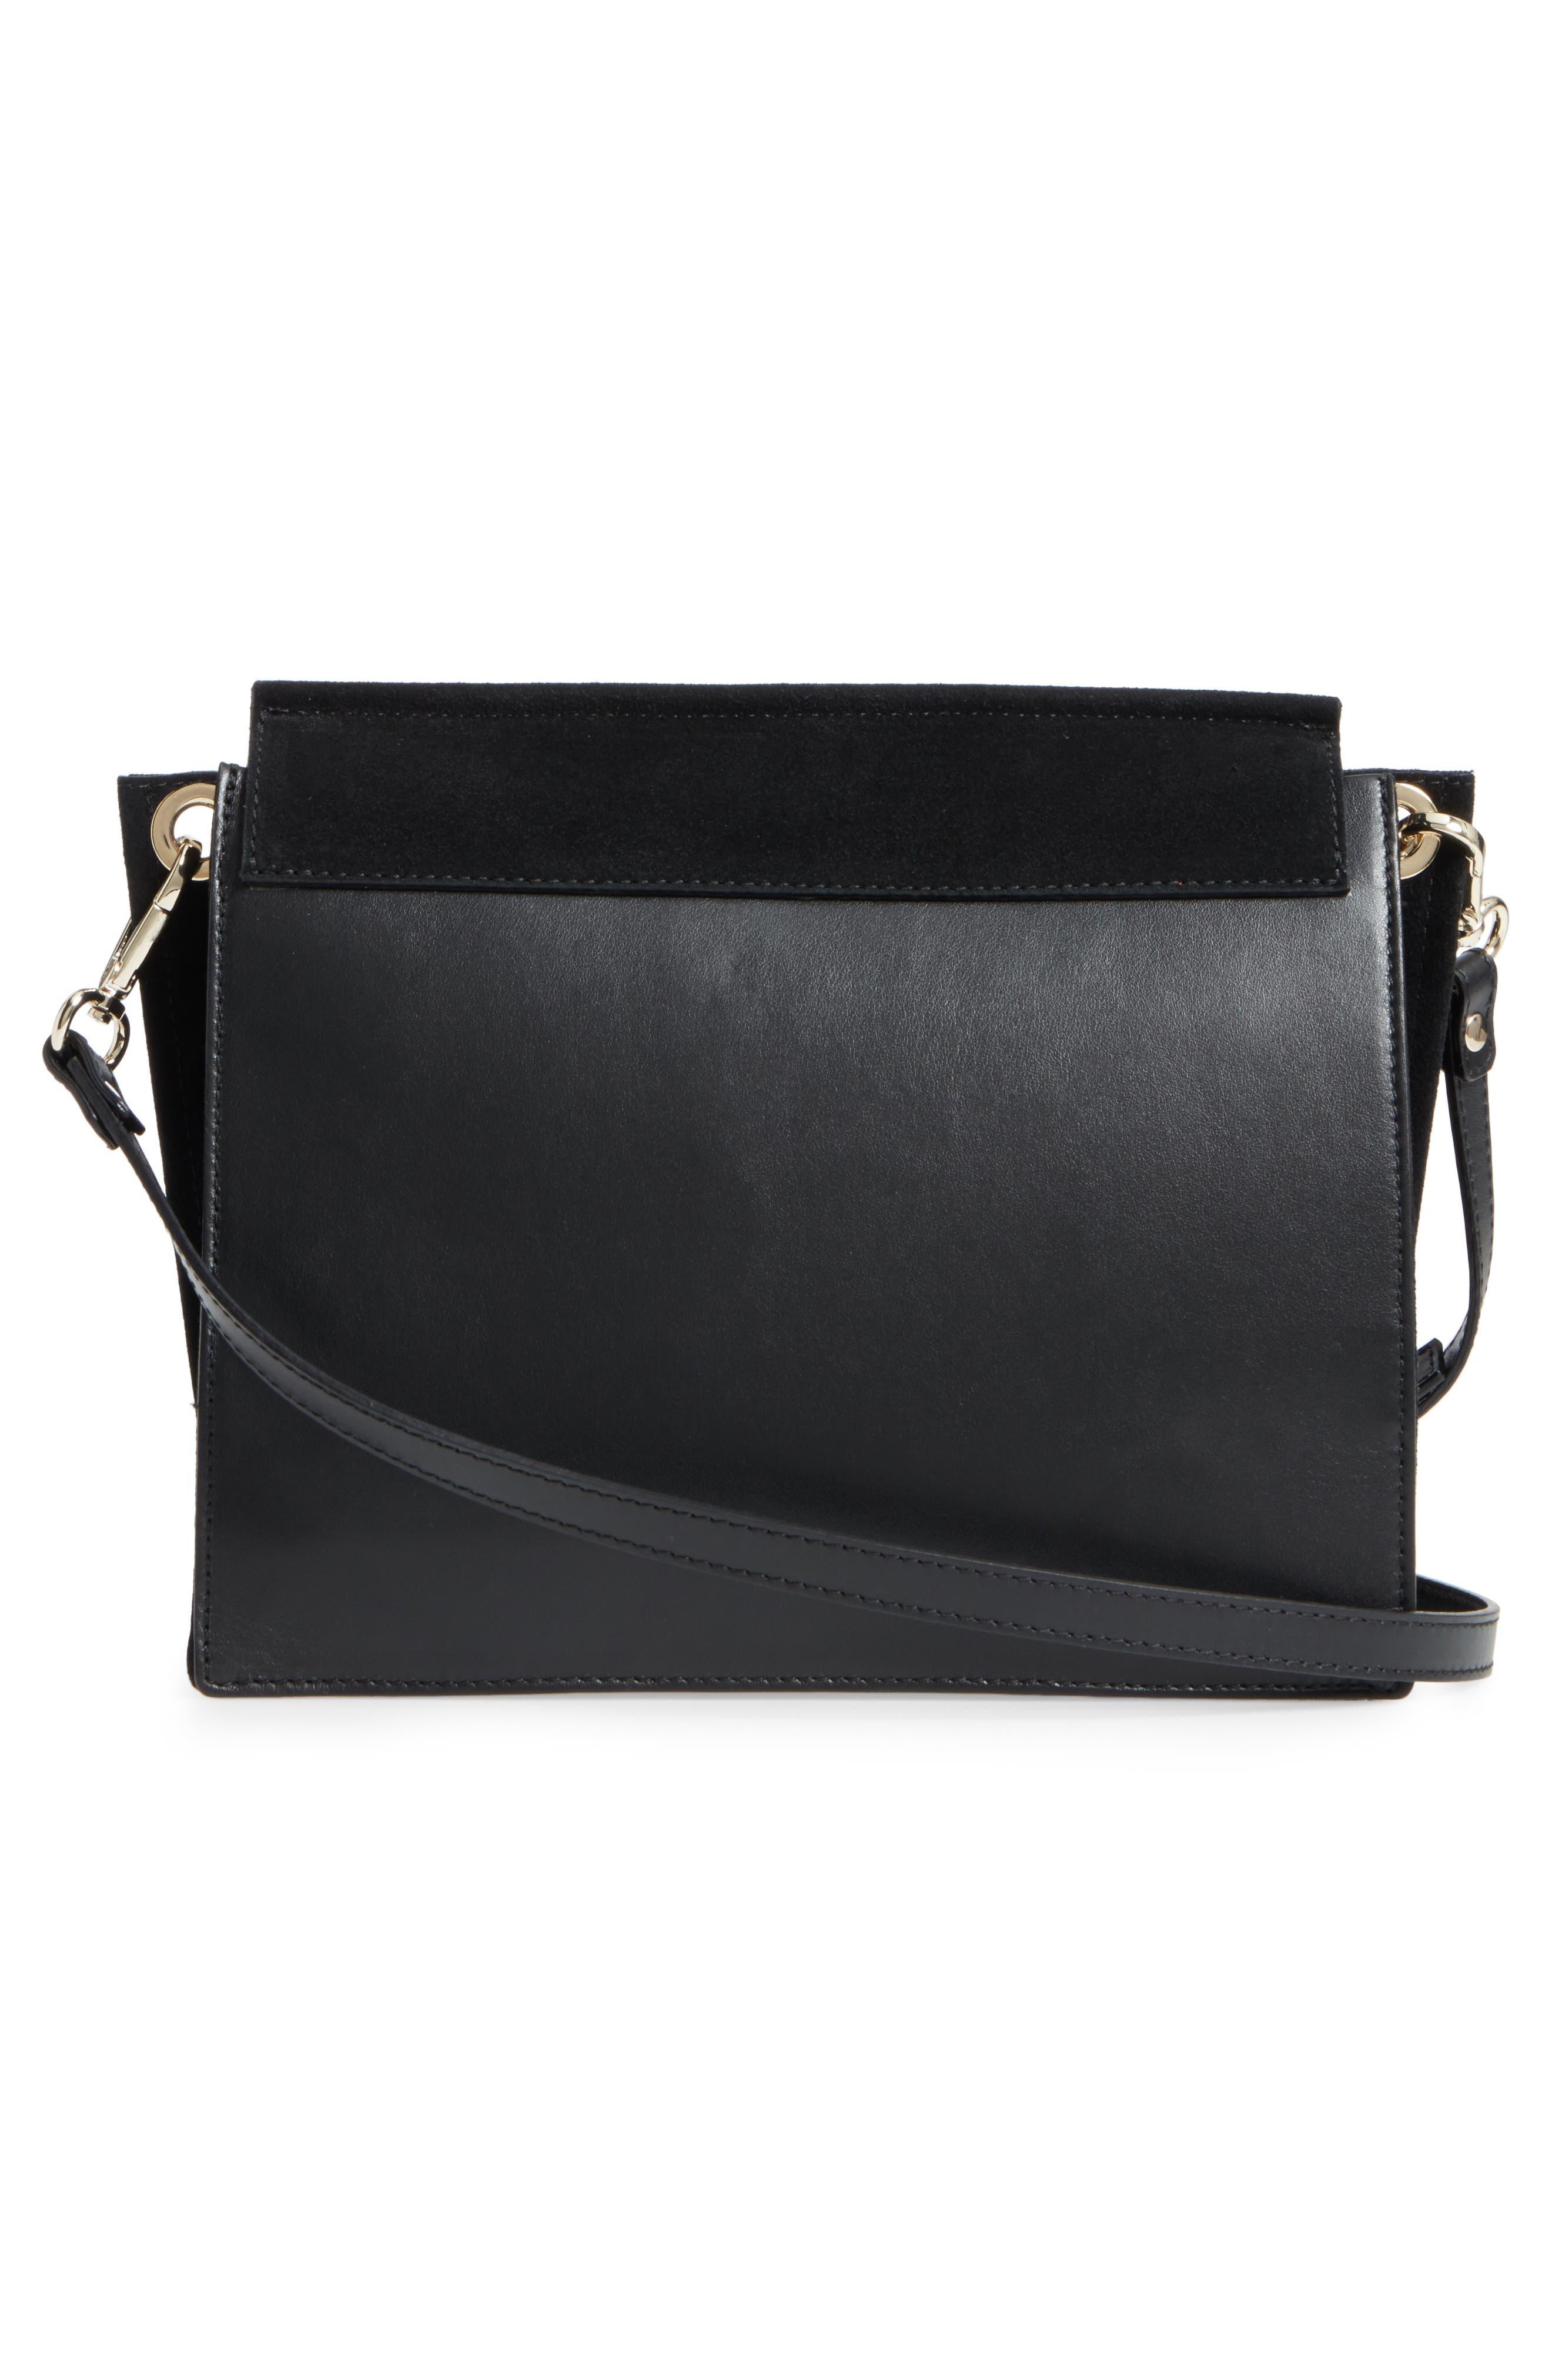 Premium Leather & Suede Soko Shoulder Bag,                             Alternate thumbnail 3, color,                             Black